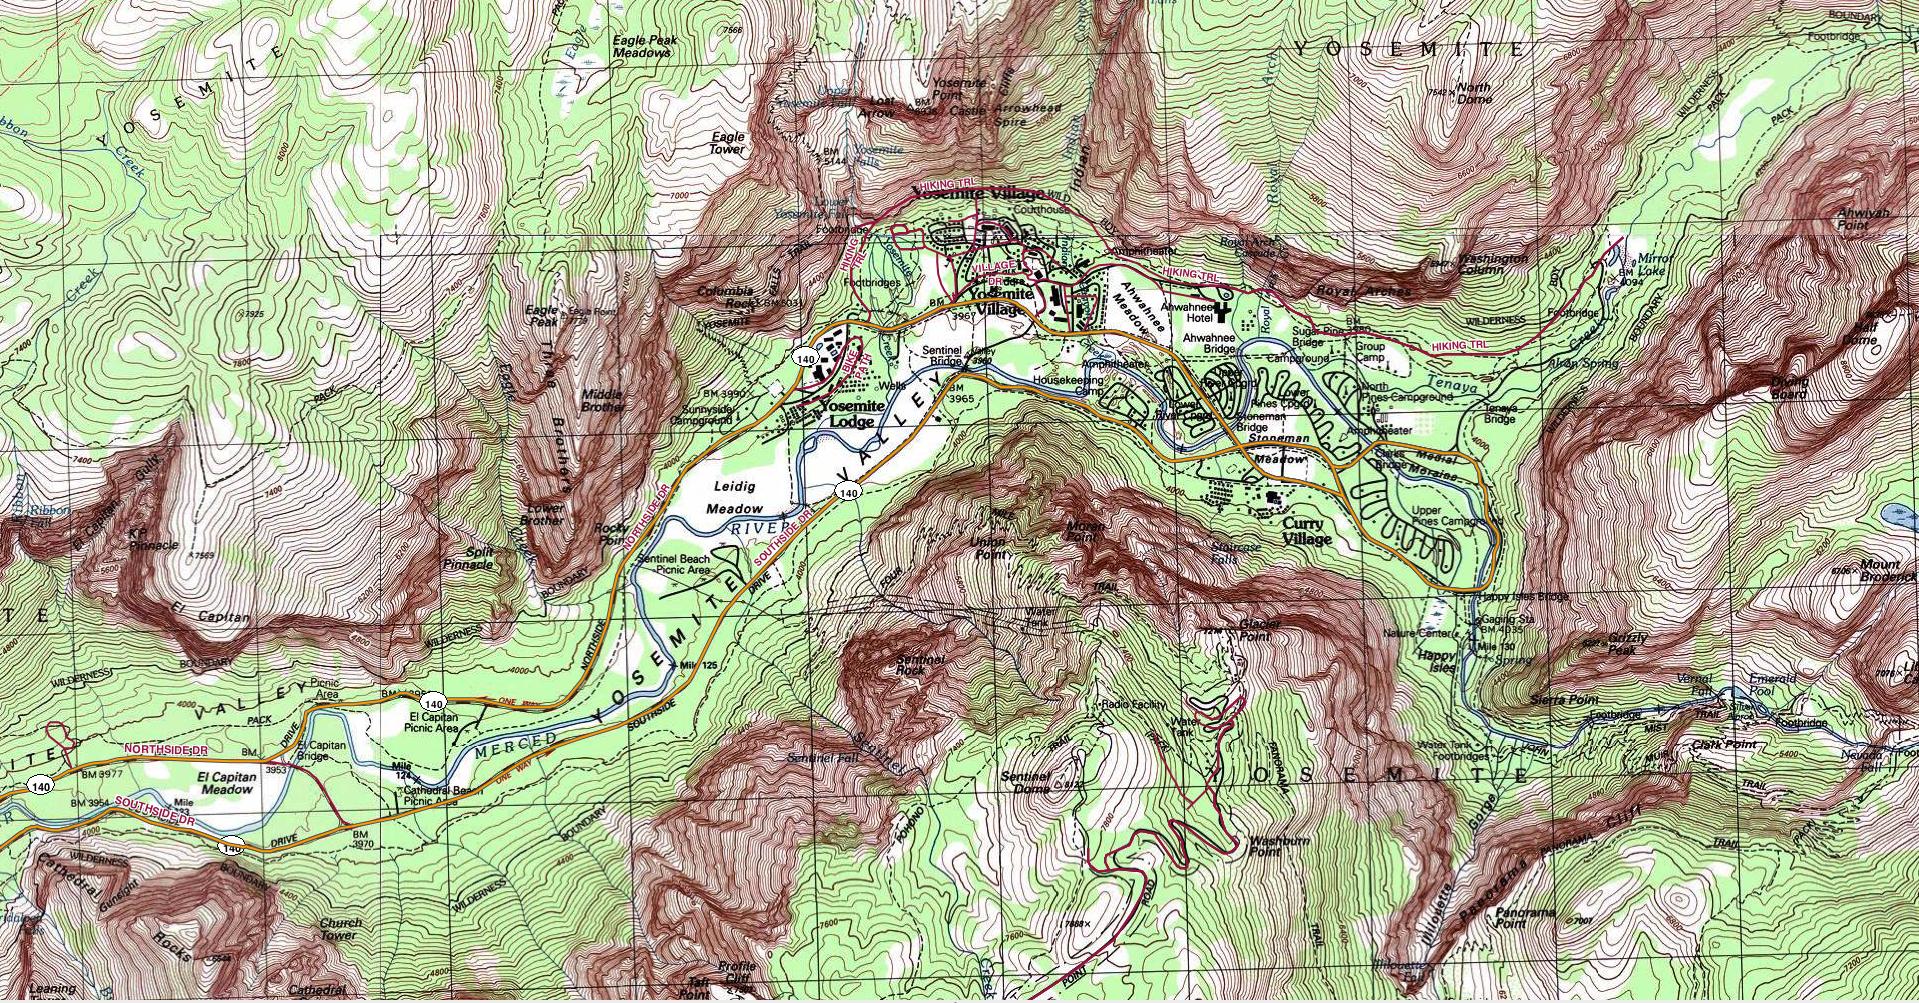 yosemite topo map   art projects   Art projects, Map, Places on yosemite mountain map, yosemite area map, john muir, sequoia national park map, yosemite region map, yosemite hiking trail map, glacier national park, yosemite land use map, ansel adams, el capitan, yosemite pass on map, yosemite lodge hotel, sierra nevada, yosemite trail map pdf, yosemite indians, bryce canyon national park, kings canyon national park, yosemite trail map topo, yosemite topographic map, redwood national and state parks, zion national park, joshua tree national park, yosemite fire map, yosemite road map, yosemite lodging map, yosemite park map, arches national park, death valley national park, yosemite falls map, sequoia national park, yosemite falls, yosemite valley, grand canyon, golden gate bridge, yosemite hotel map, grand canyon national park, yosemite backpacking routes, yellowstone national park, yosemite altitude map, half dome,